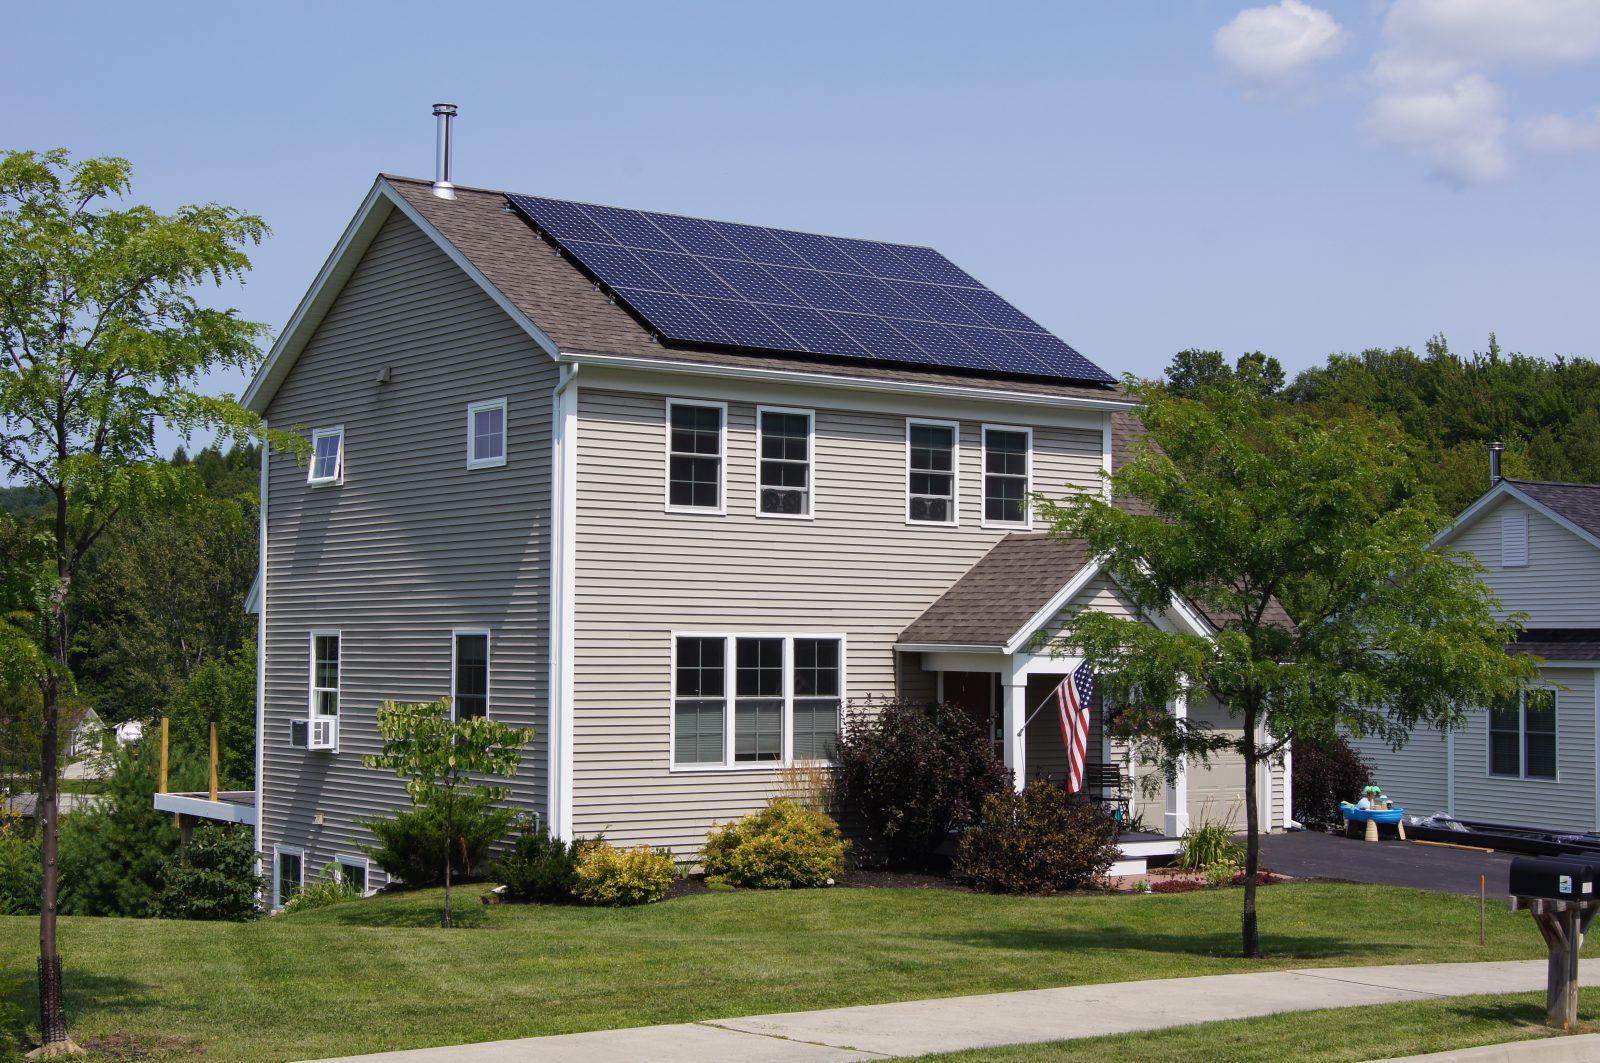 Wayne Maceyka Home Solar Hinesburg Vermont